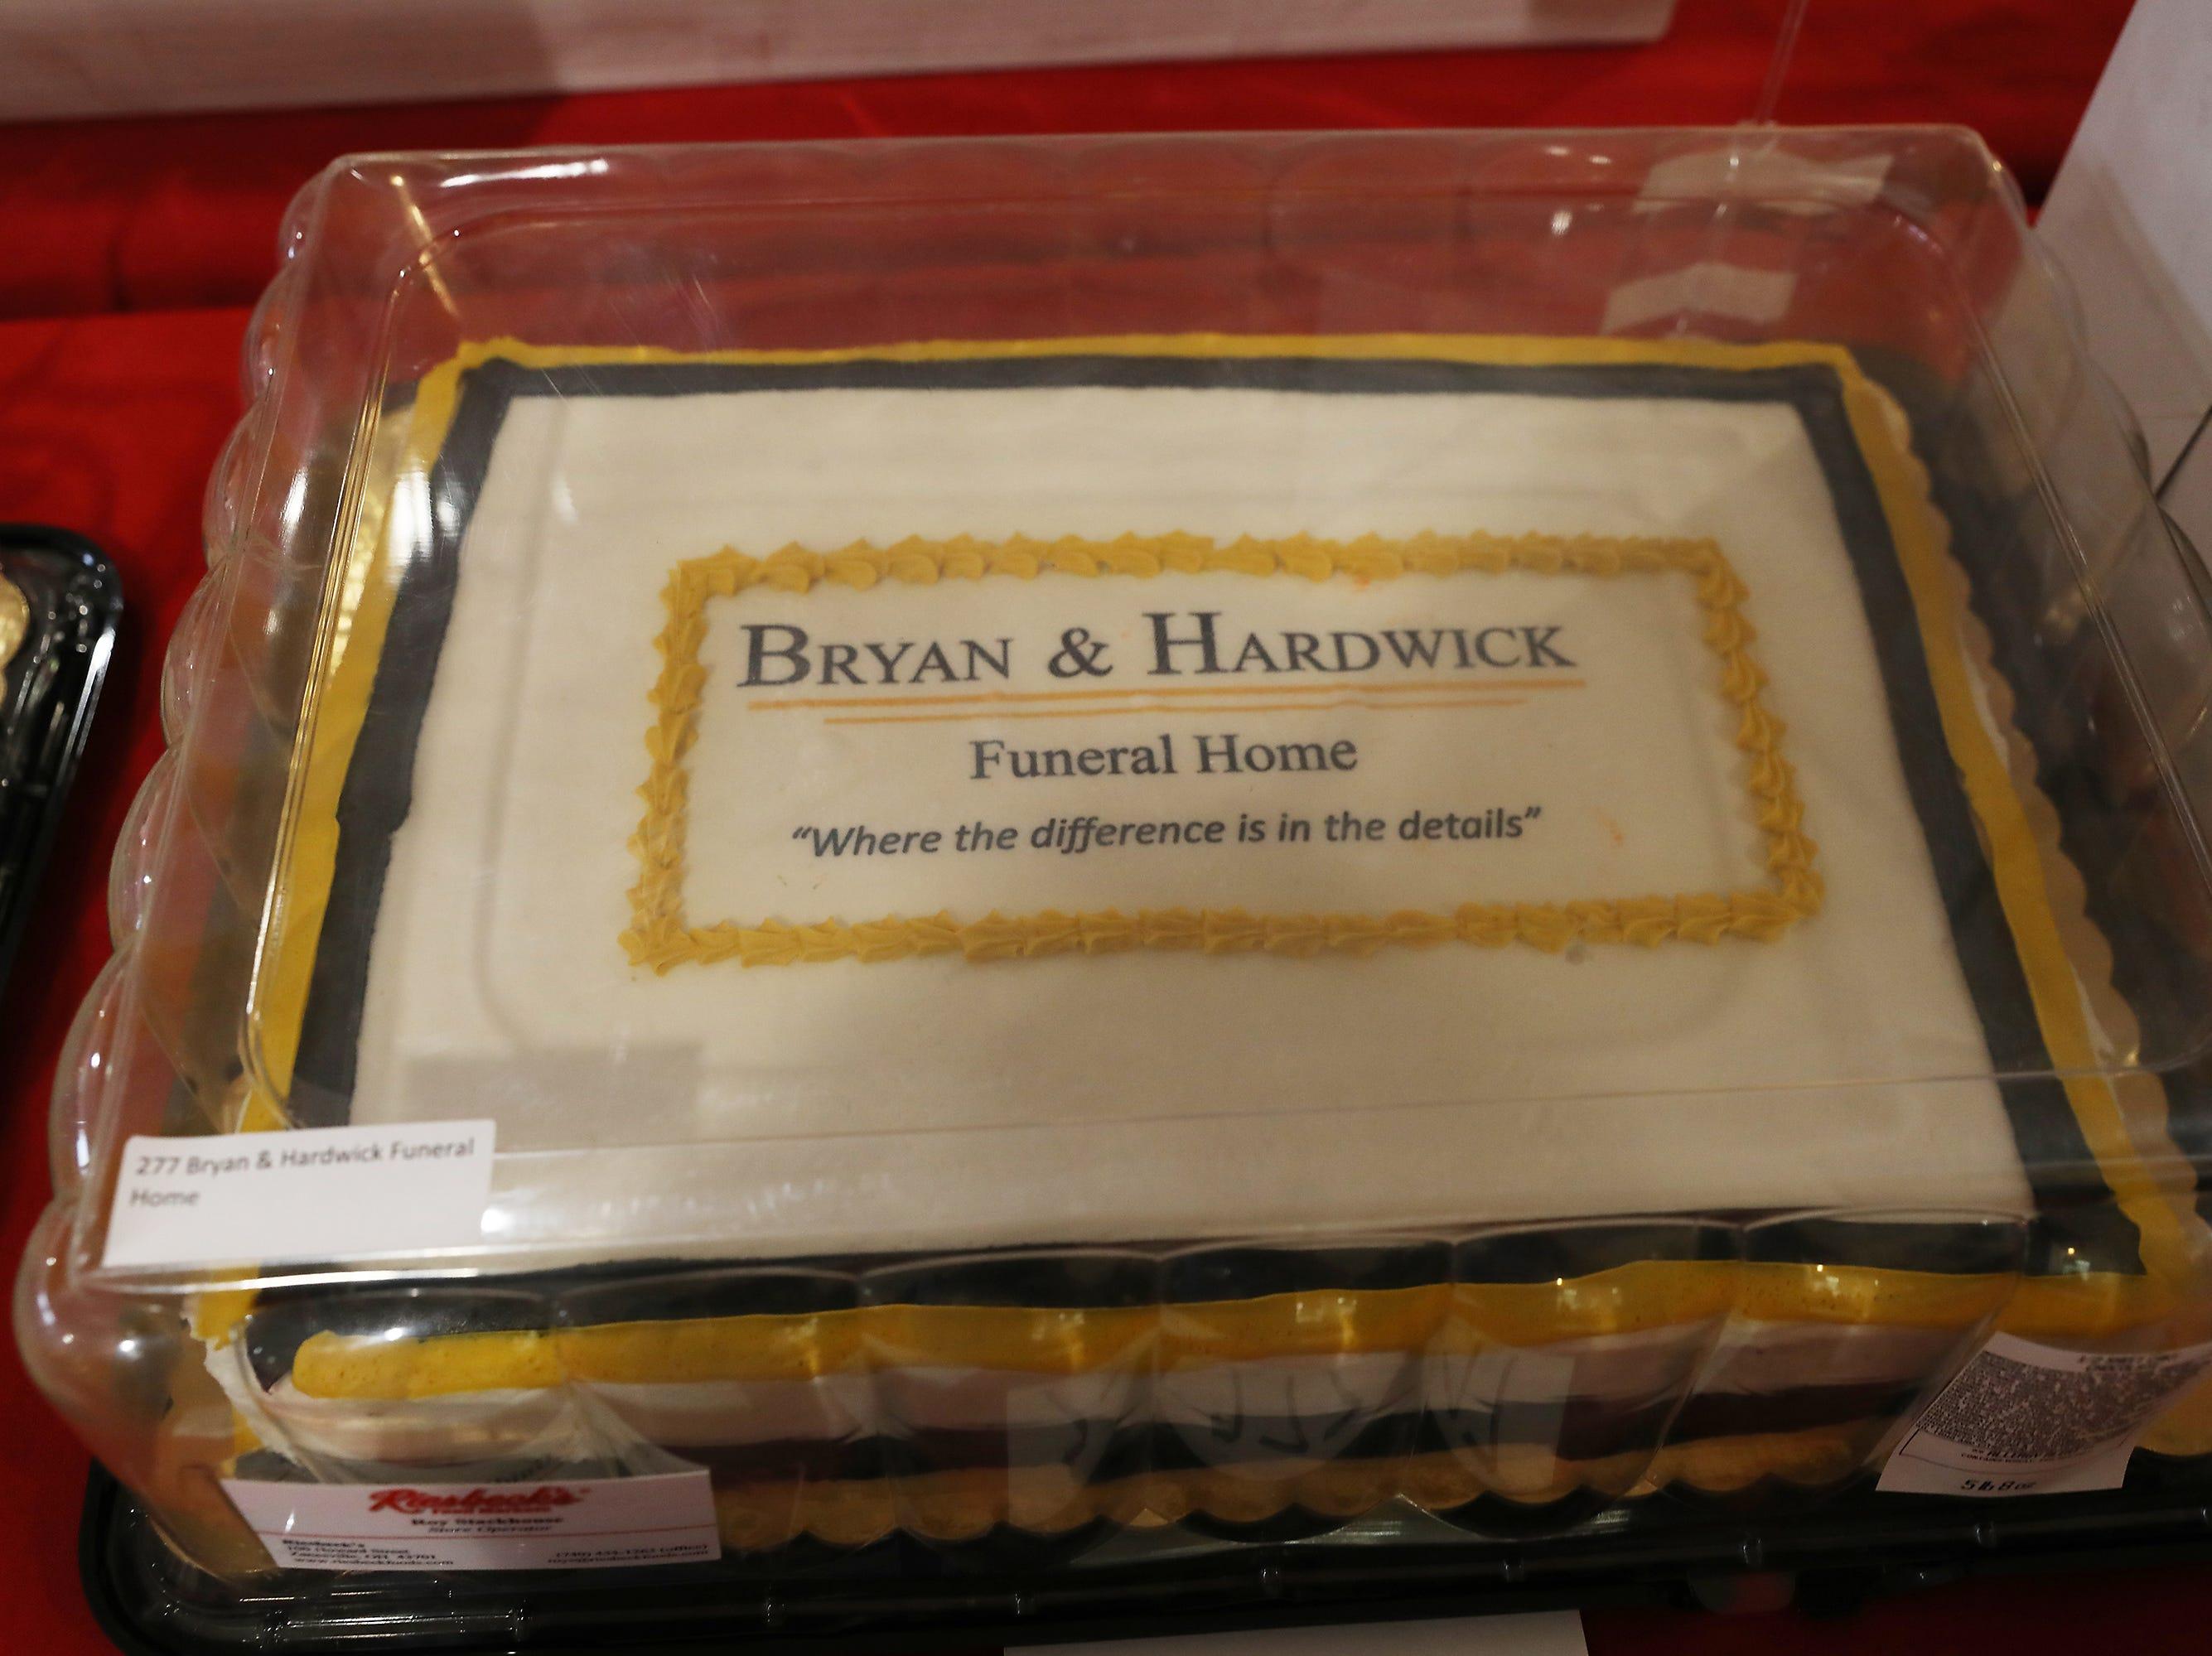 11 A.M. Friday cake 277 Bryan & Hardwick Funeral Home - $100 Adornetto's gift card, $100 Winerak, print of Zanesville